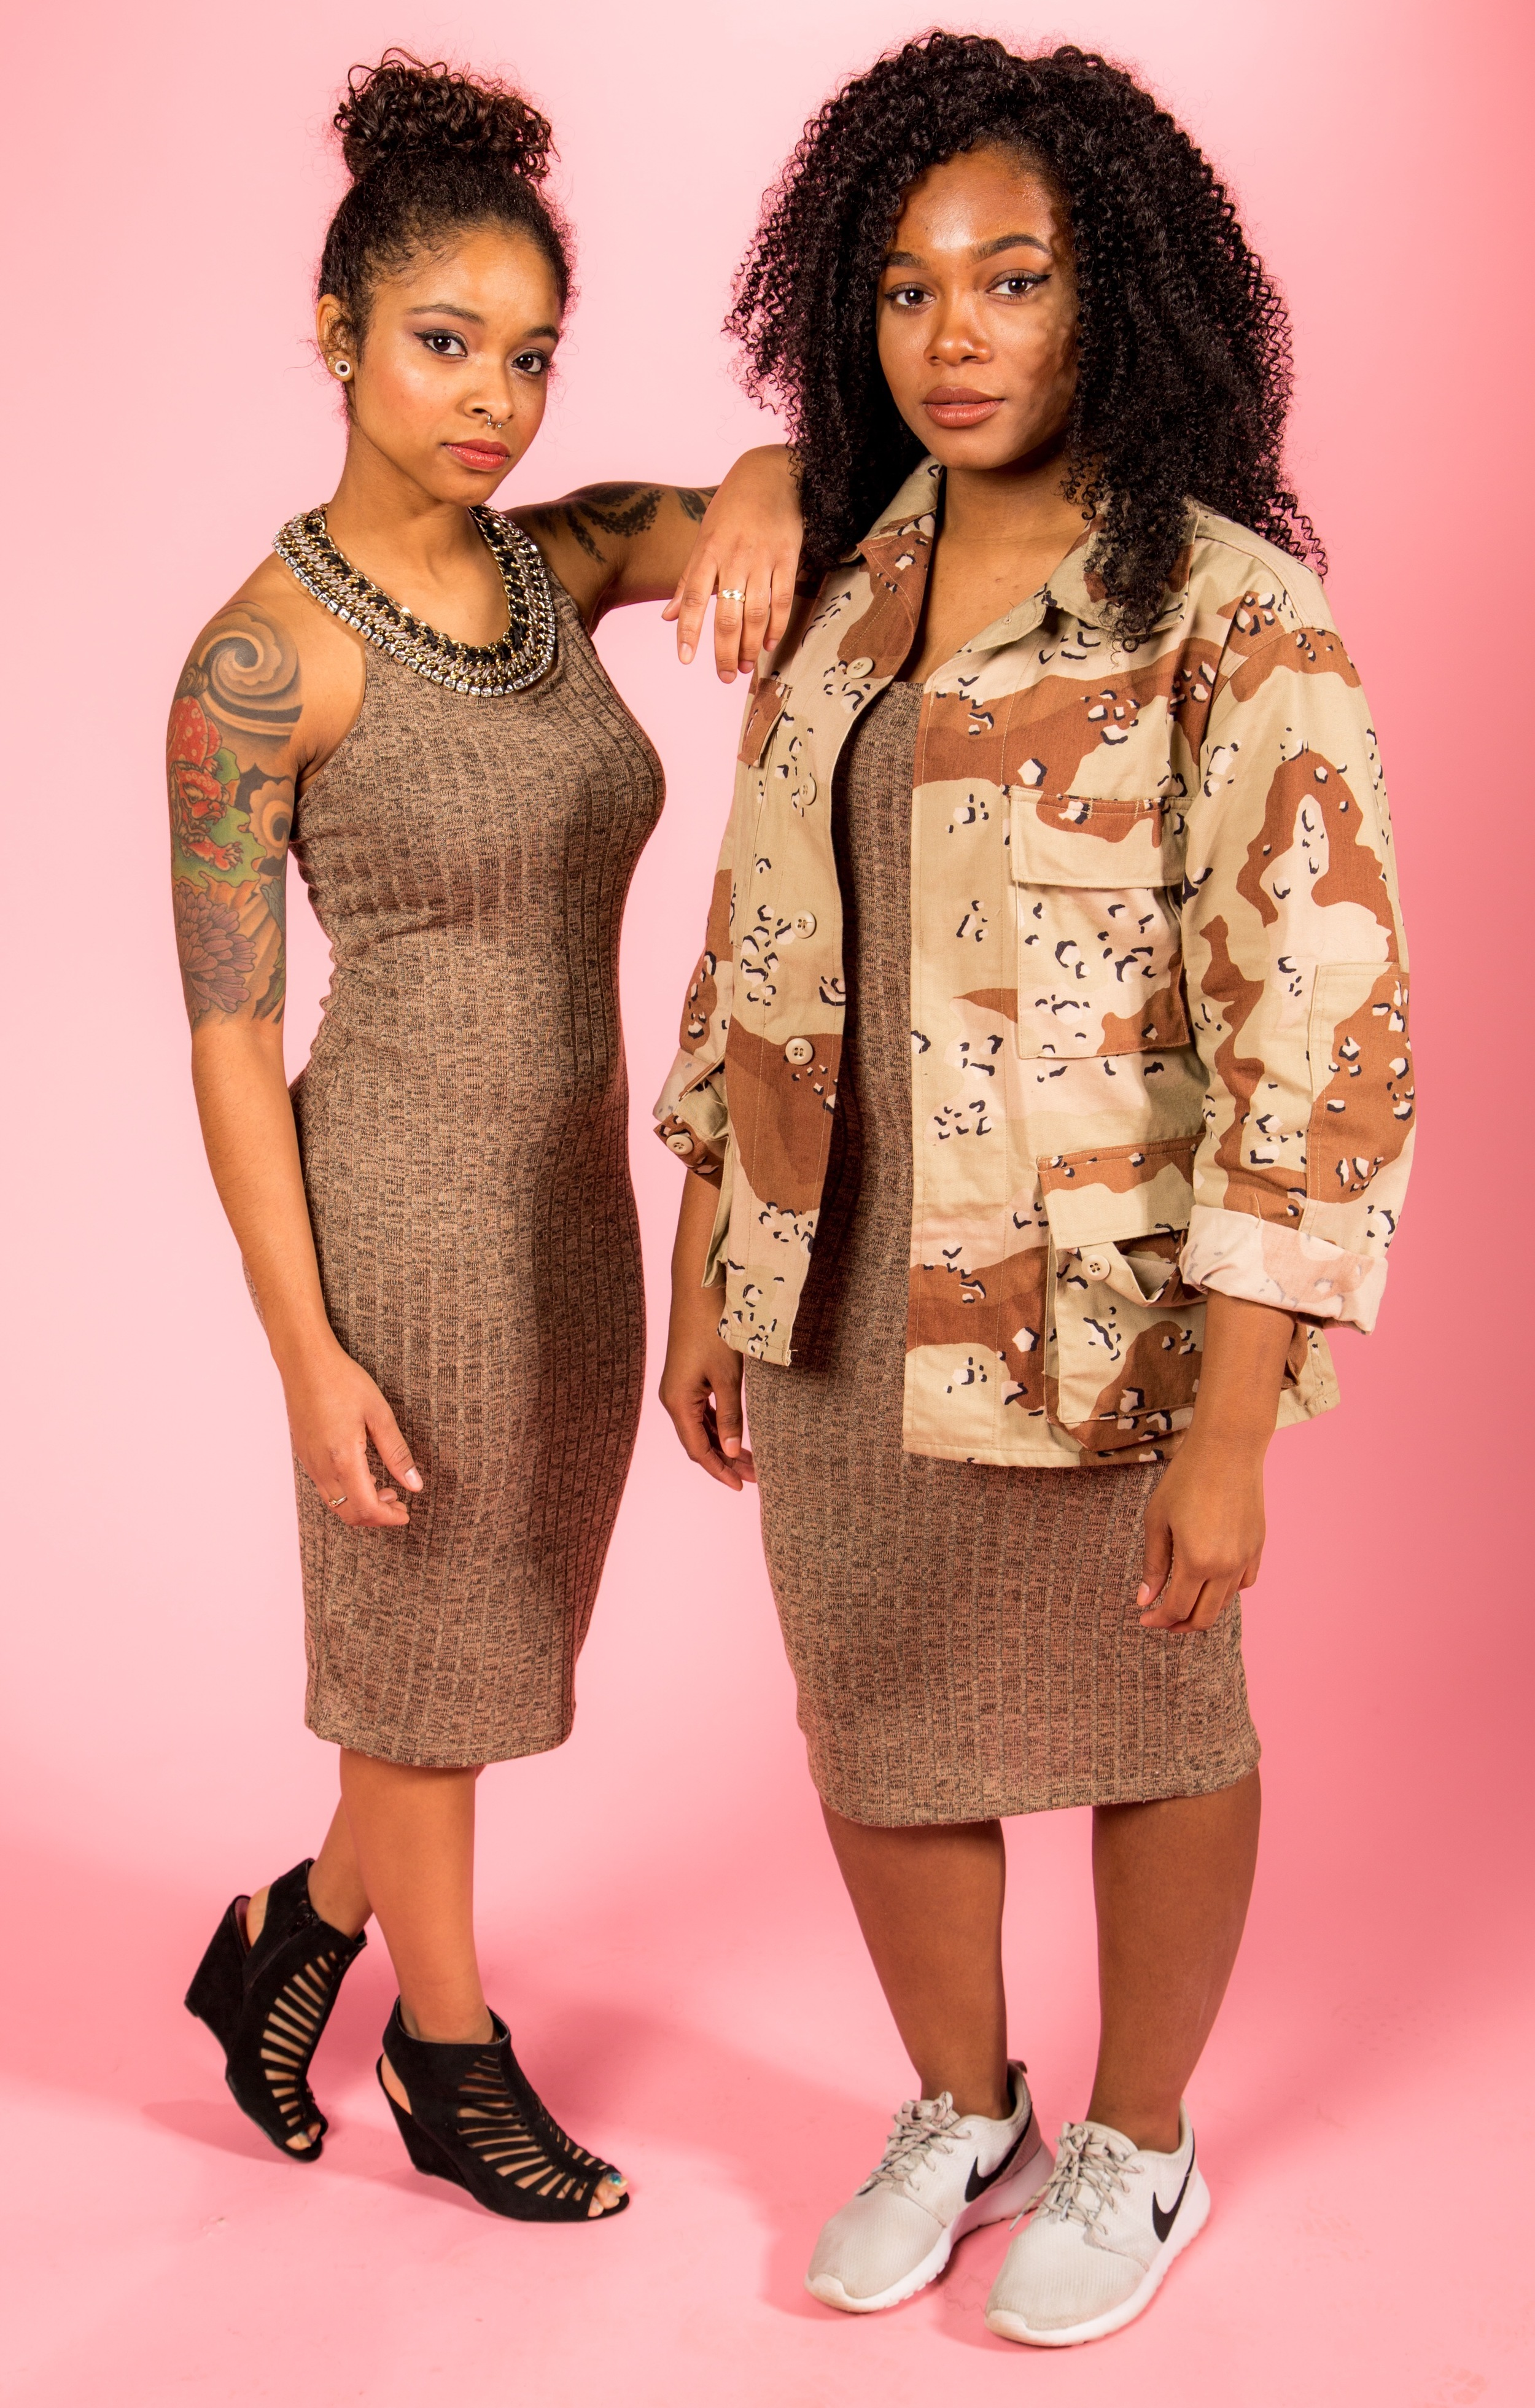 Cross Back Dress - $16.80 // Desert Camo Jacket - $34.00